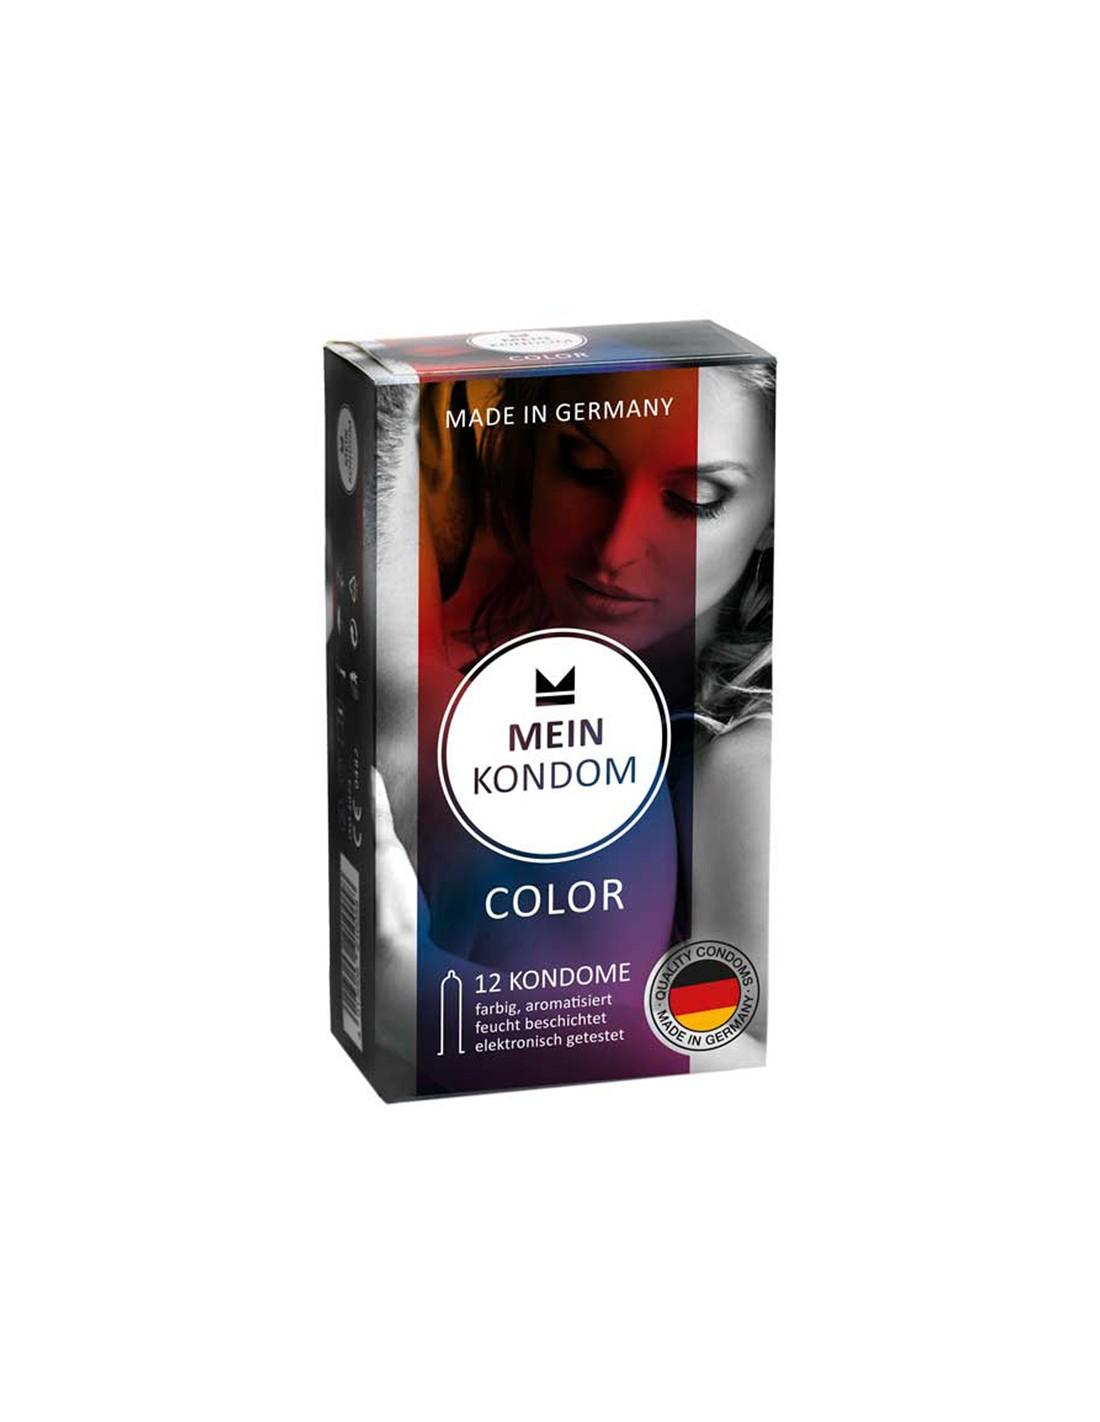 Mein Kondomer i farver - 12 Stk